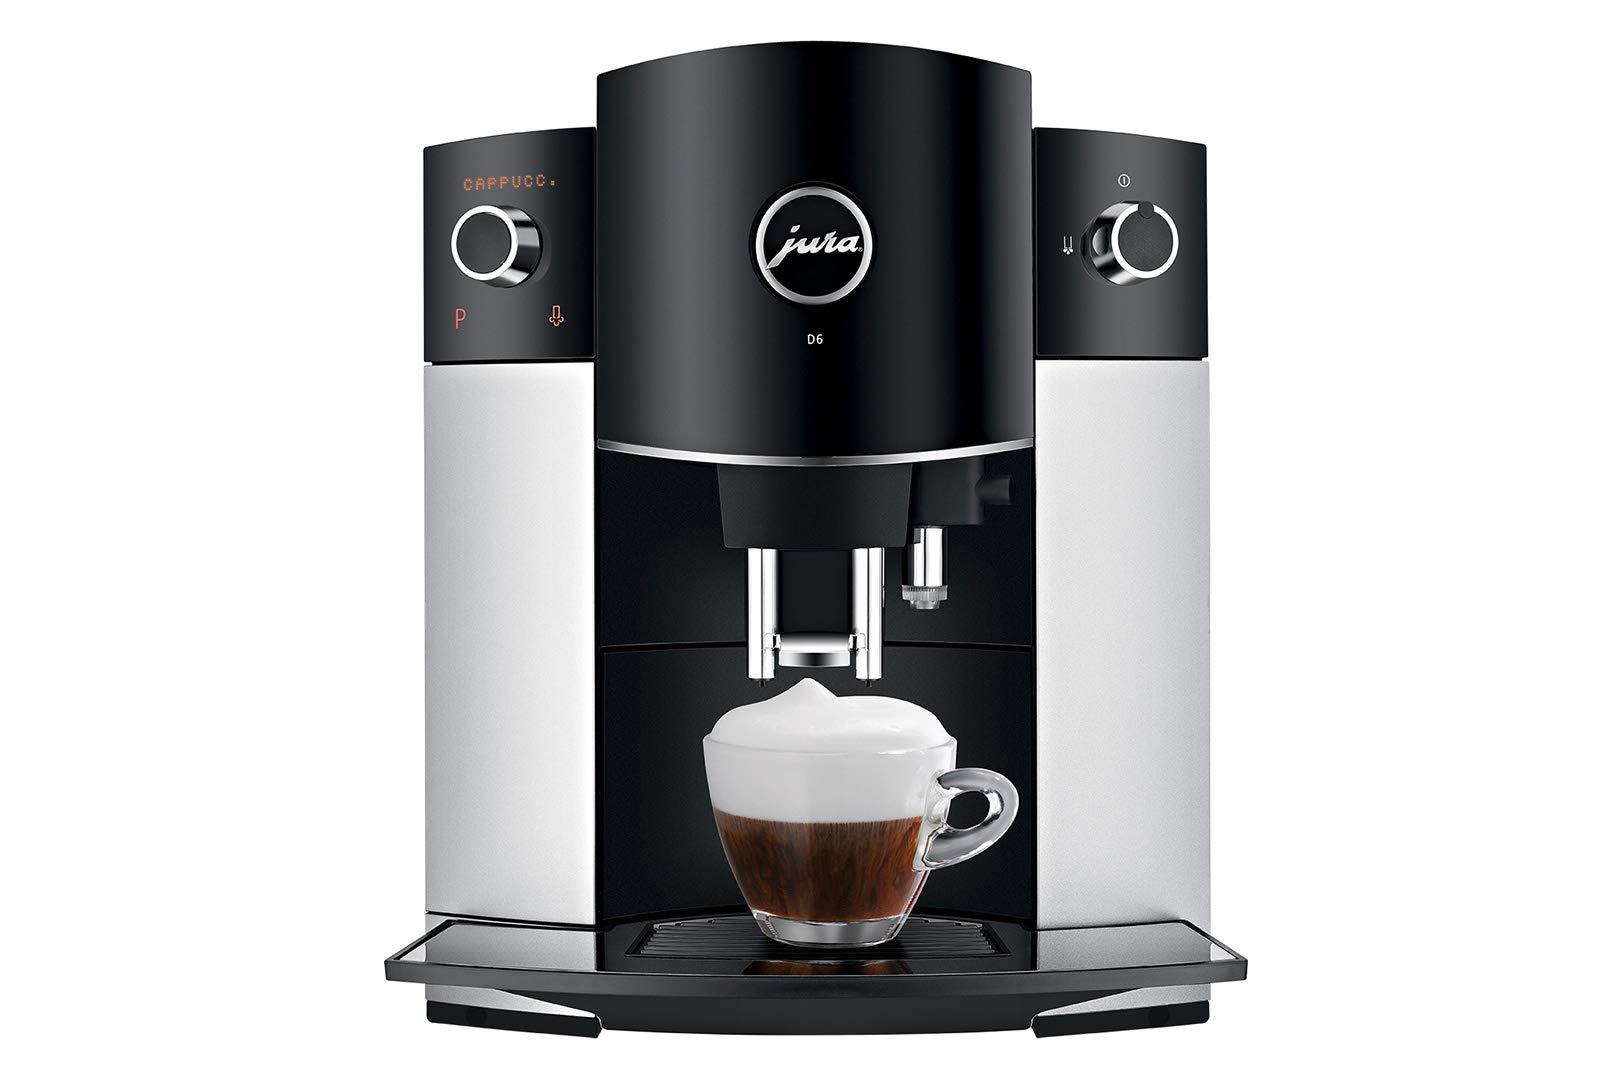 JURA D6 Independiente Máquina espresso Negro, Platino 1,9 L 16 tazas Totalmente automática - Cafetera (Independiente, Máquina espresso, 1,9 L, Molinillo integrado, 1450 W, Negro, Platino): Amazon.es: Hogar